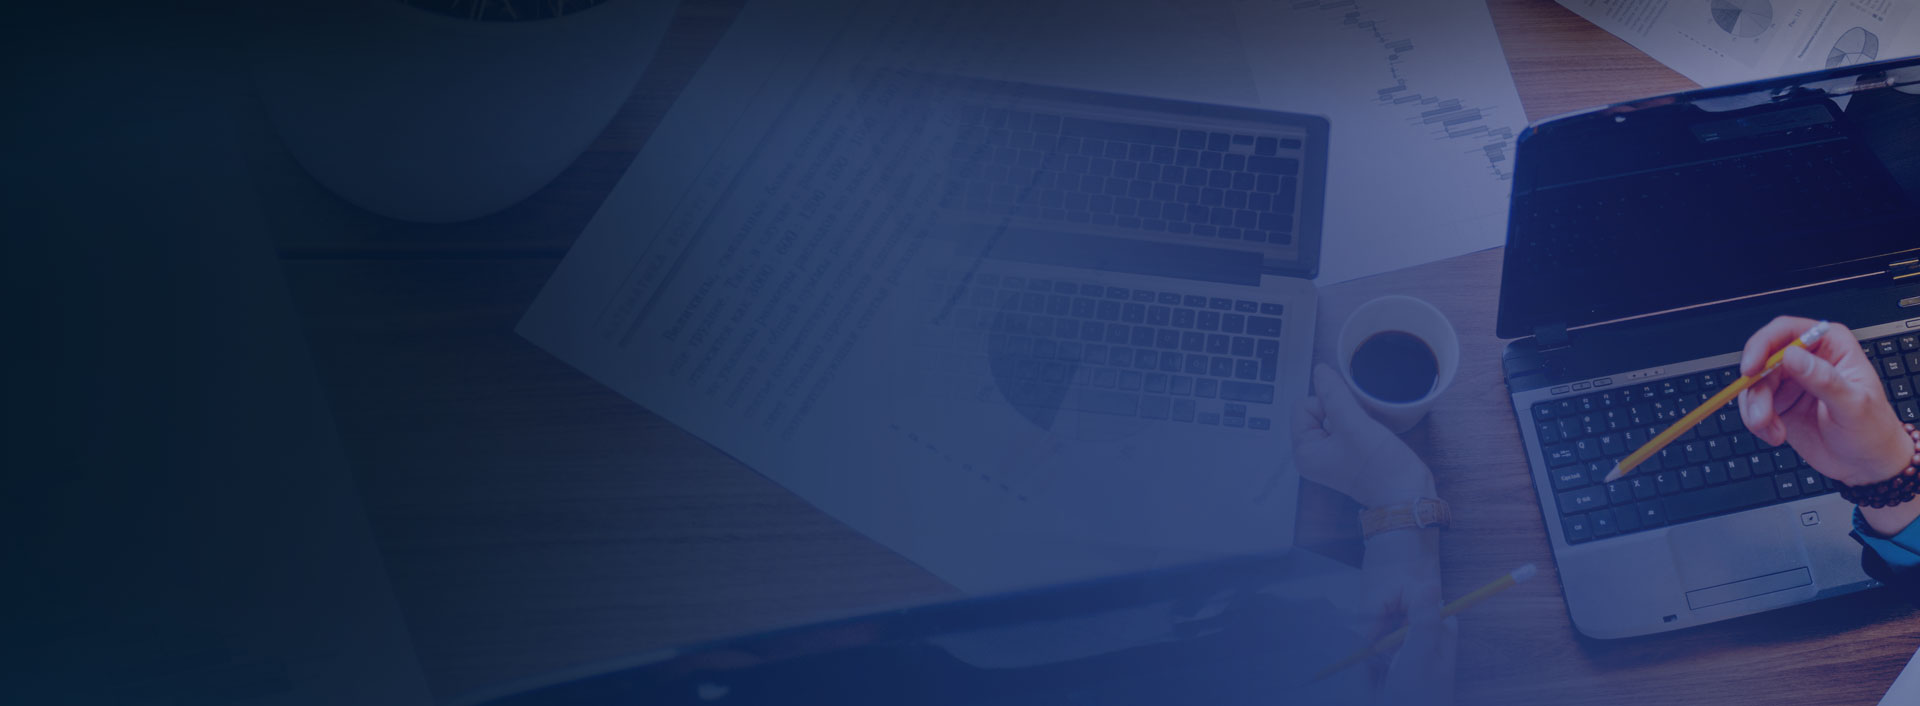 AudioCodes Windows Server Security Update Validation